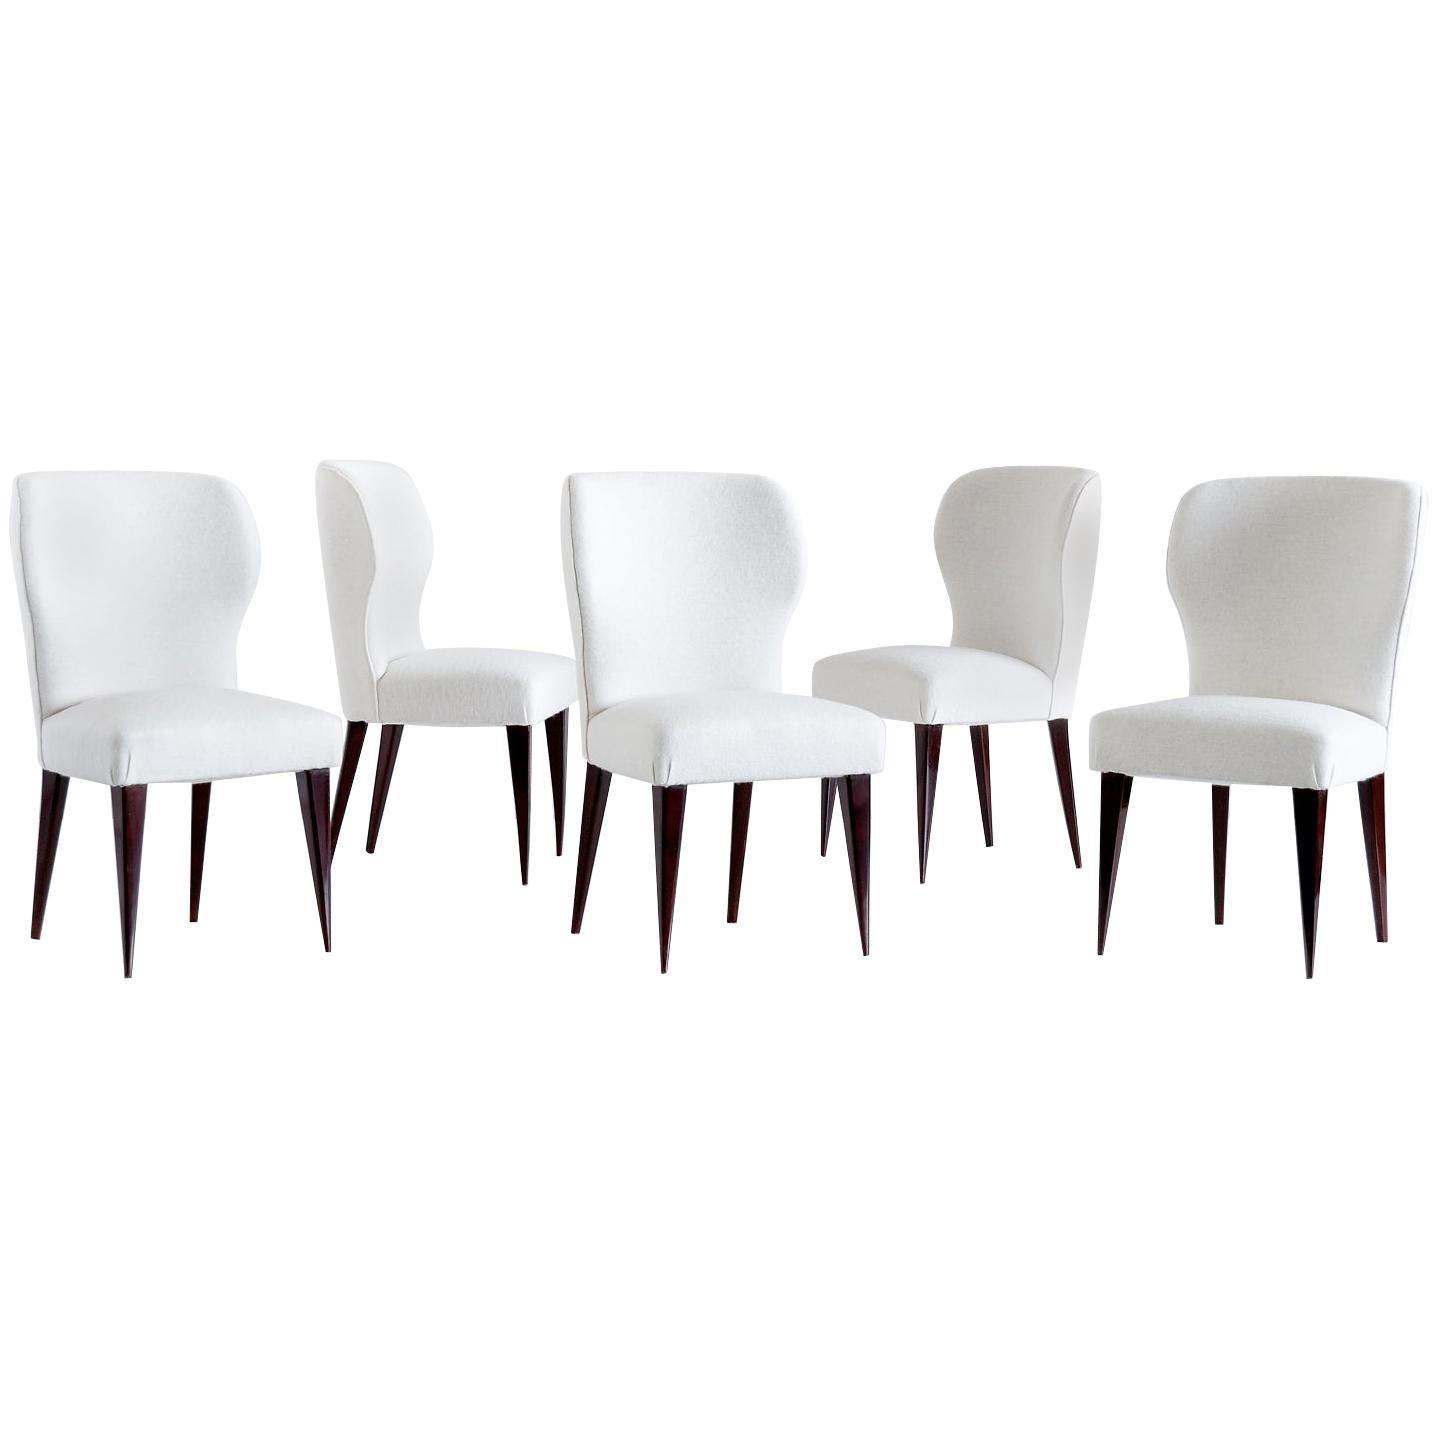 Set of Five Gio Ponti Dining Chairs for Casa e Giardino, Italy, 1942